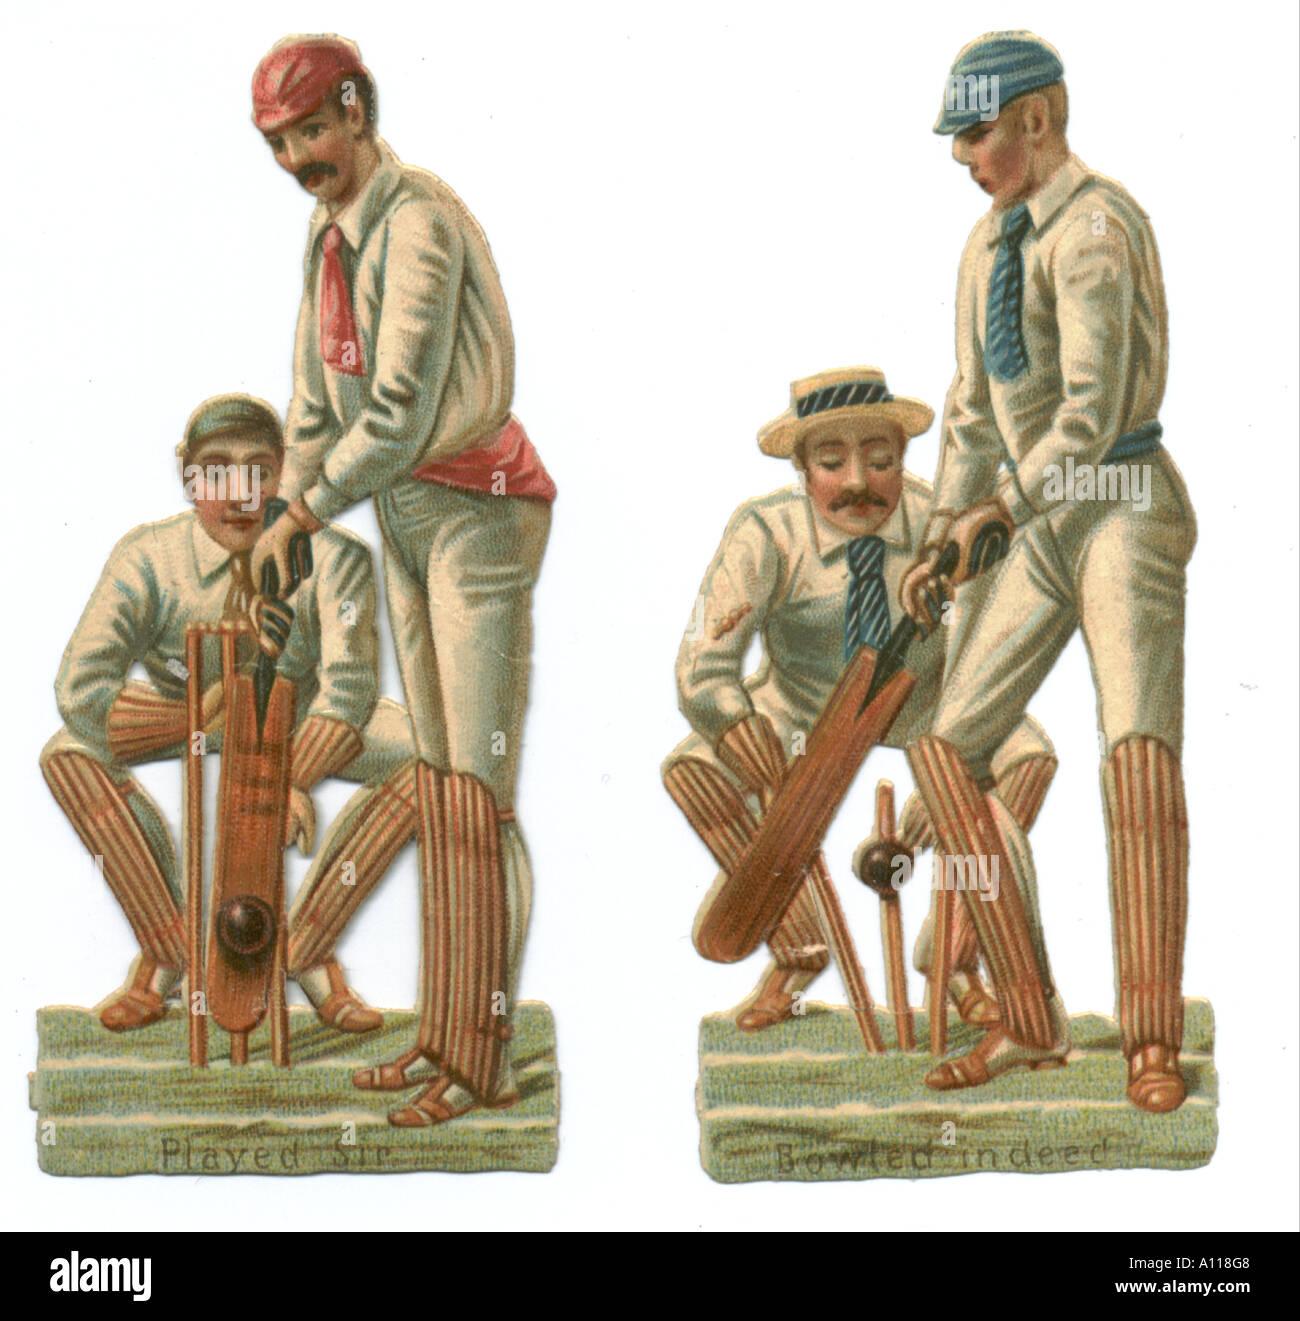 Cricketing die cut scraps circa 1880 - Stock Image